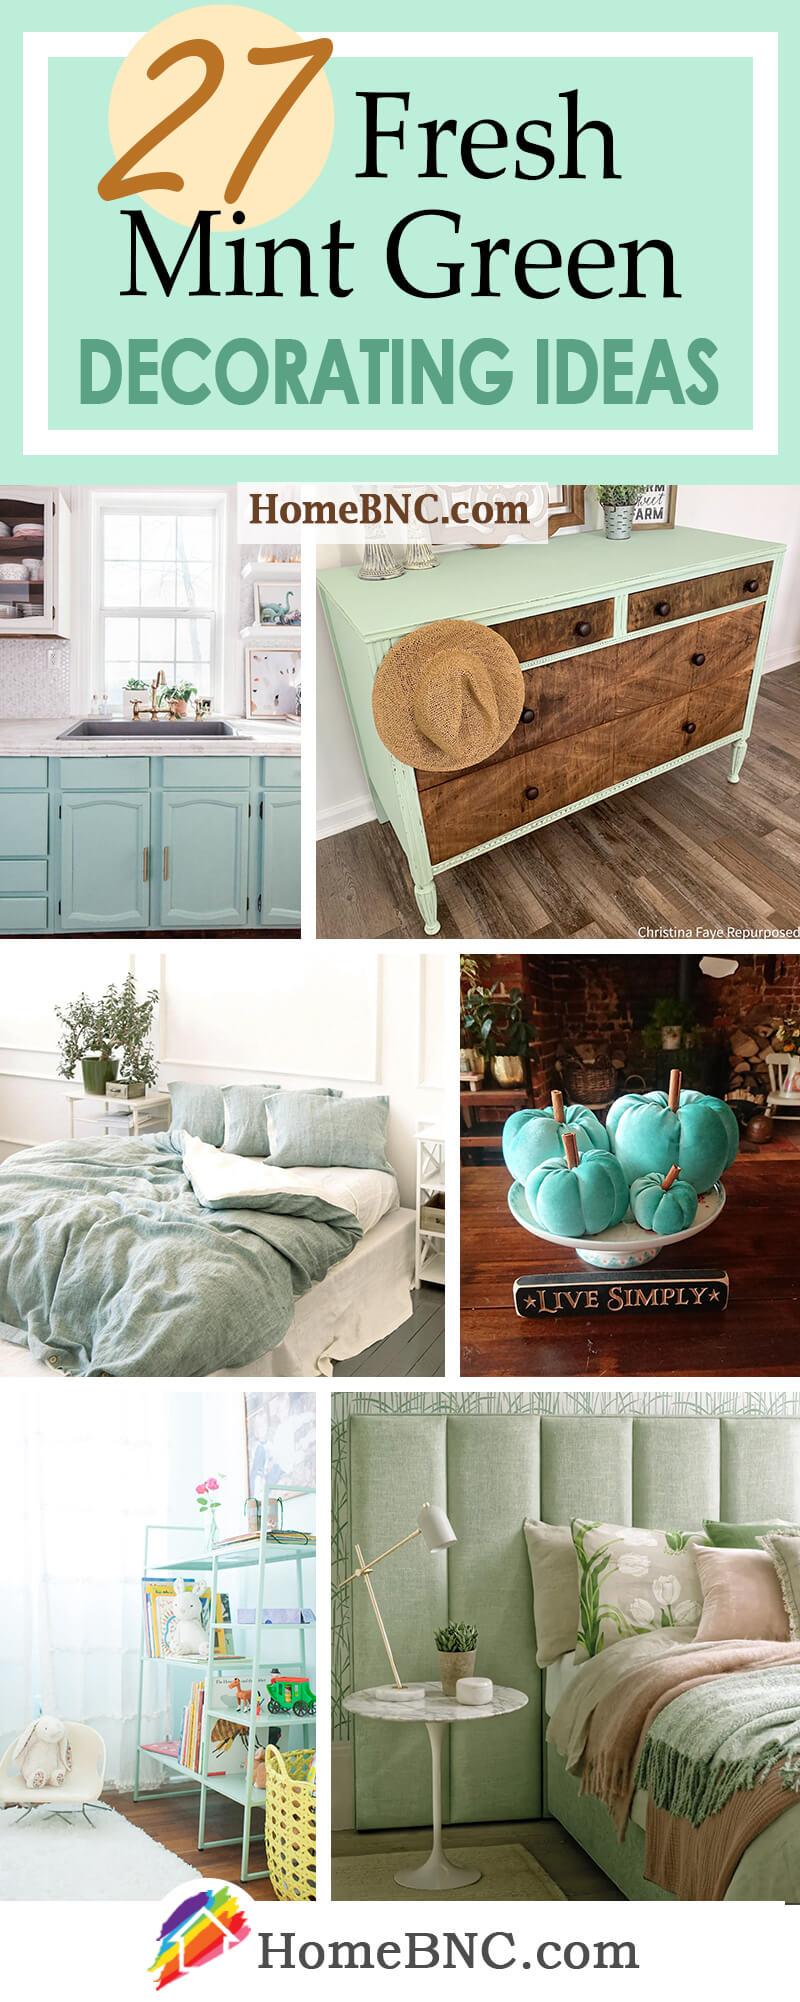 Mint Green Home Decor Ideas